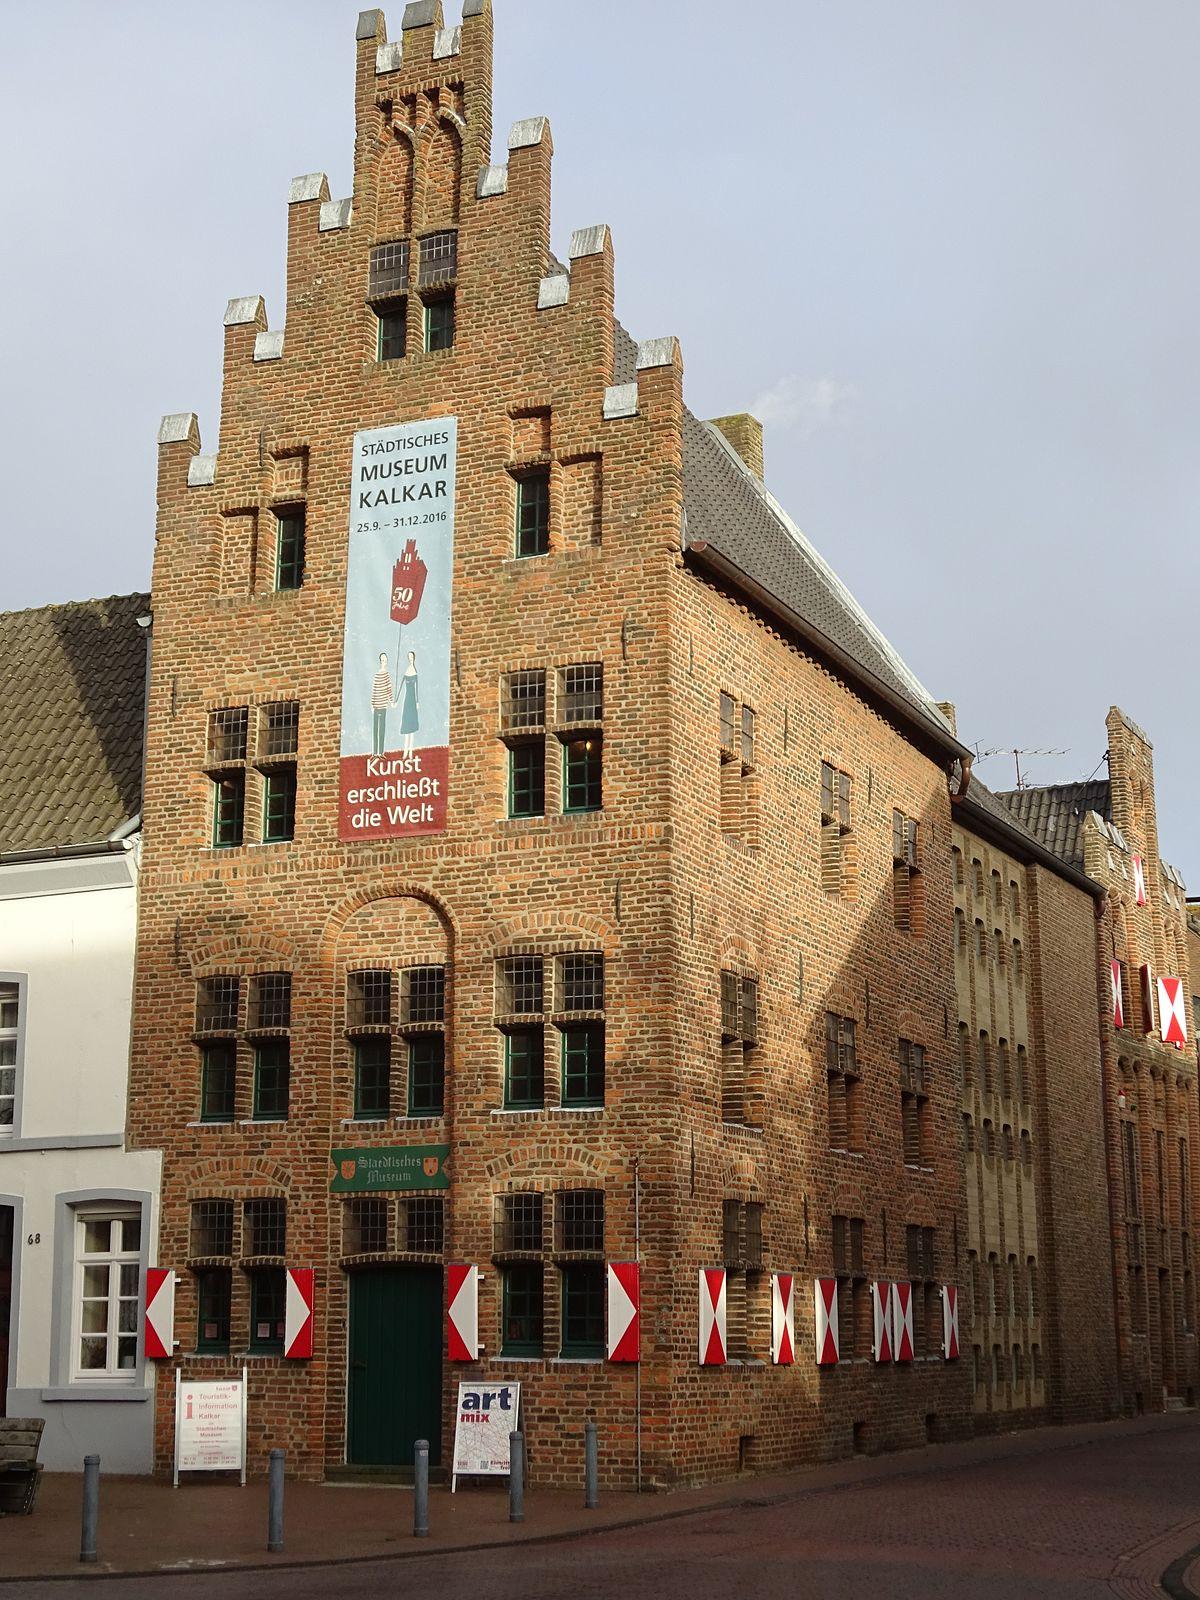 Städtisches Museum Kalkar – Wikipedia